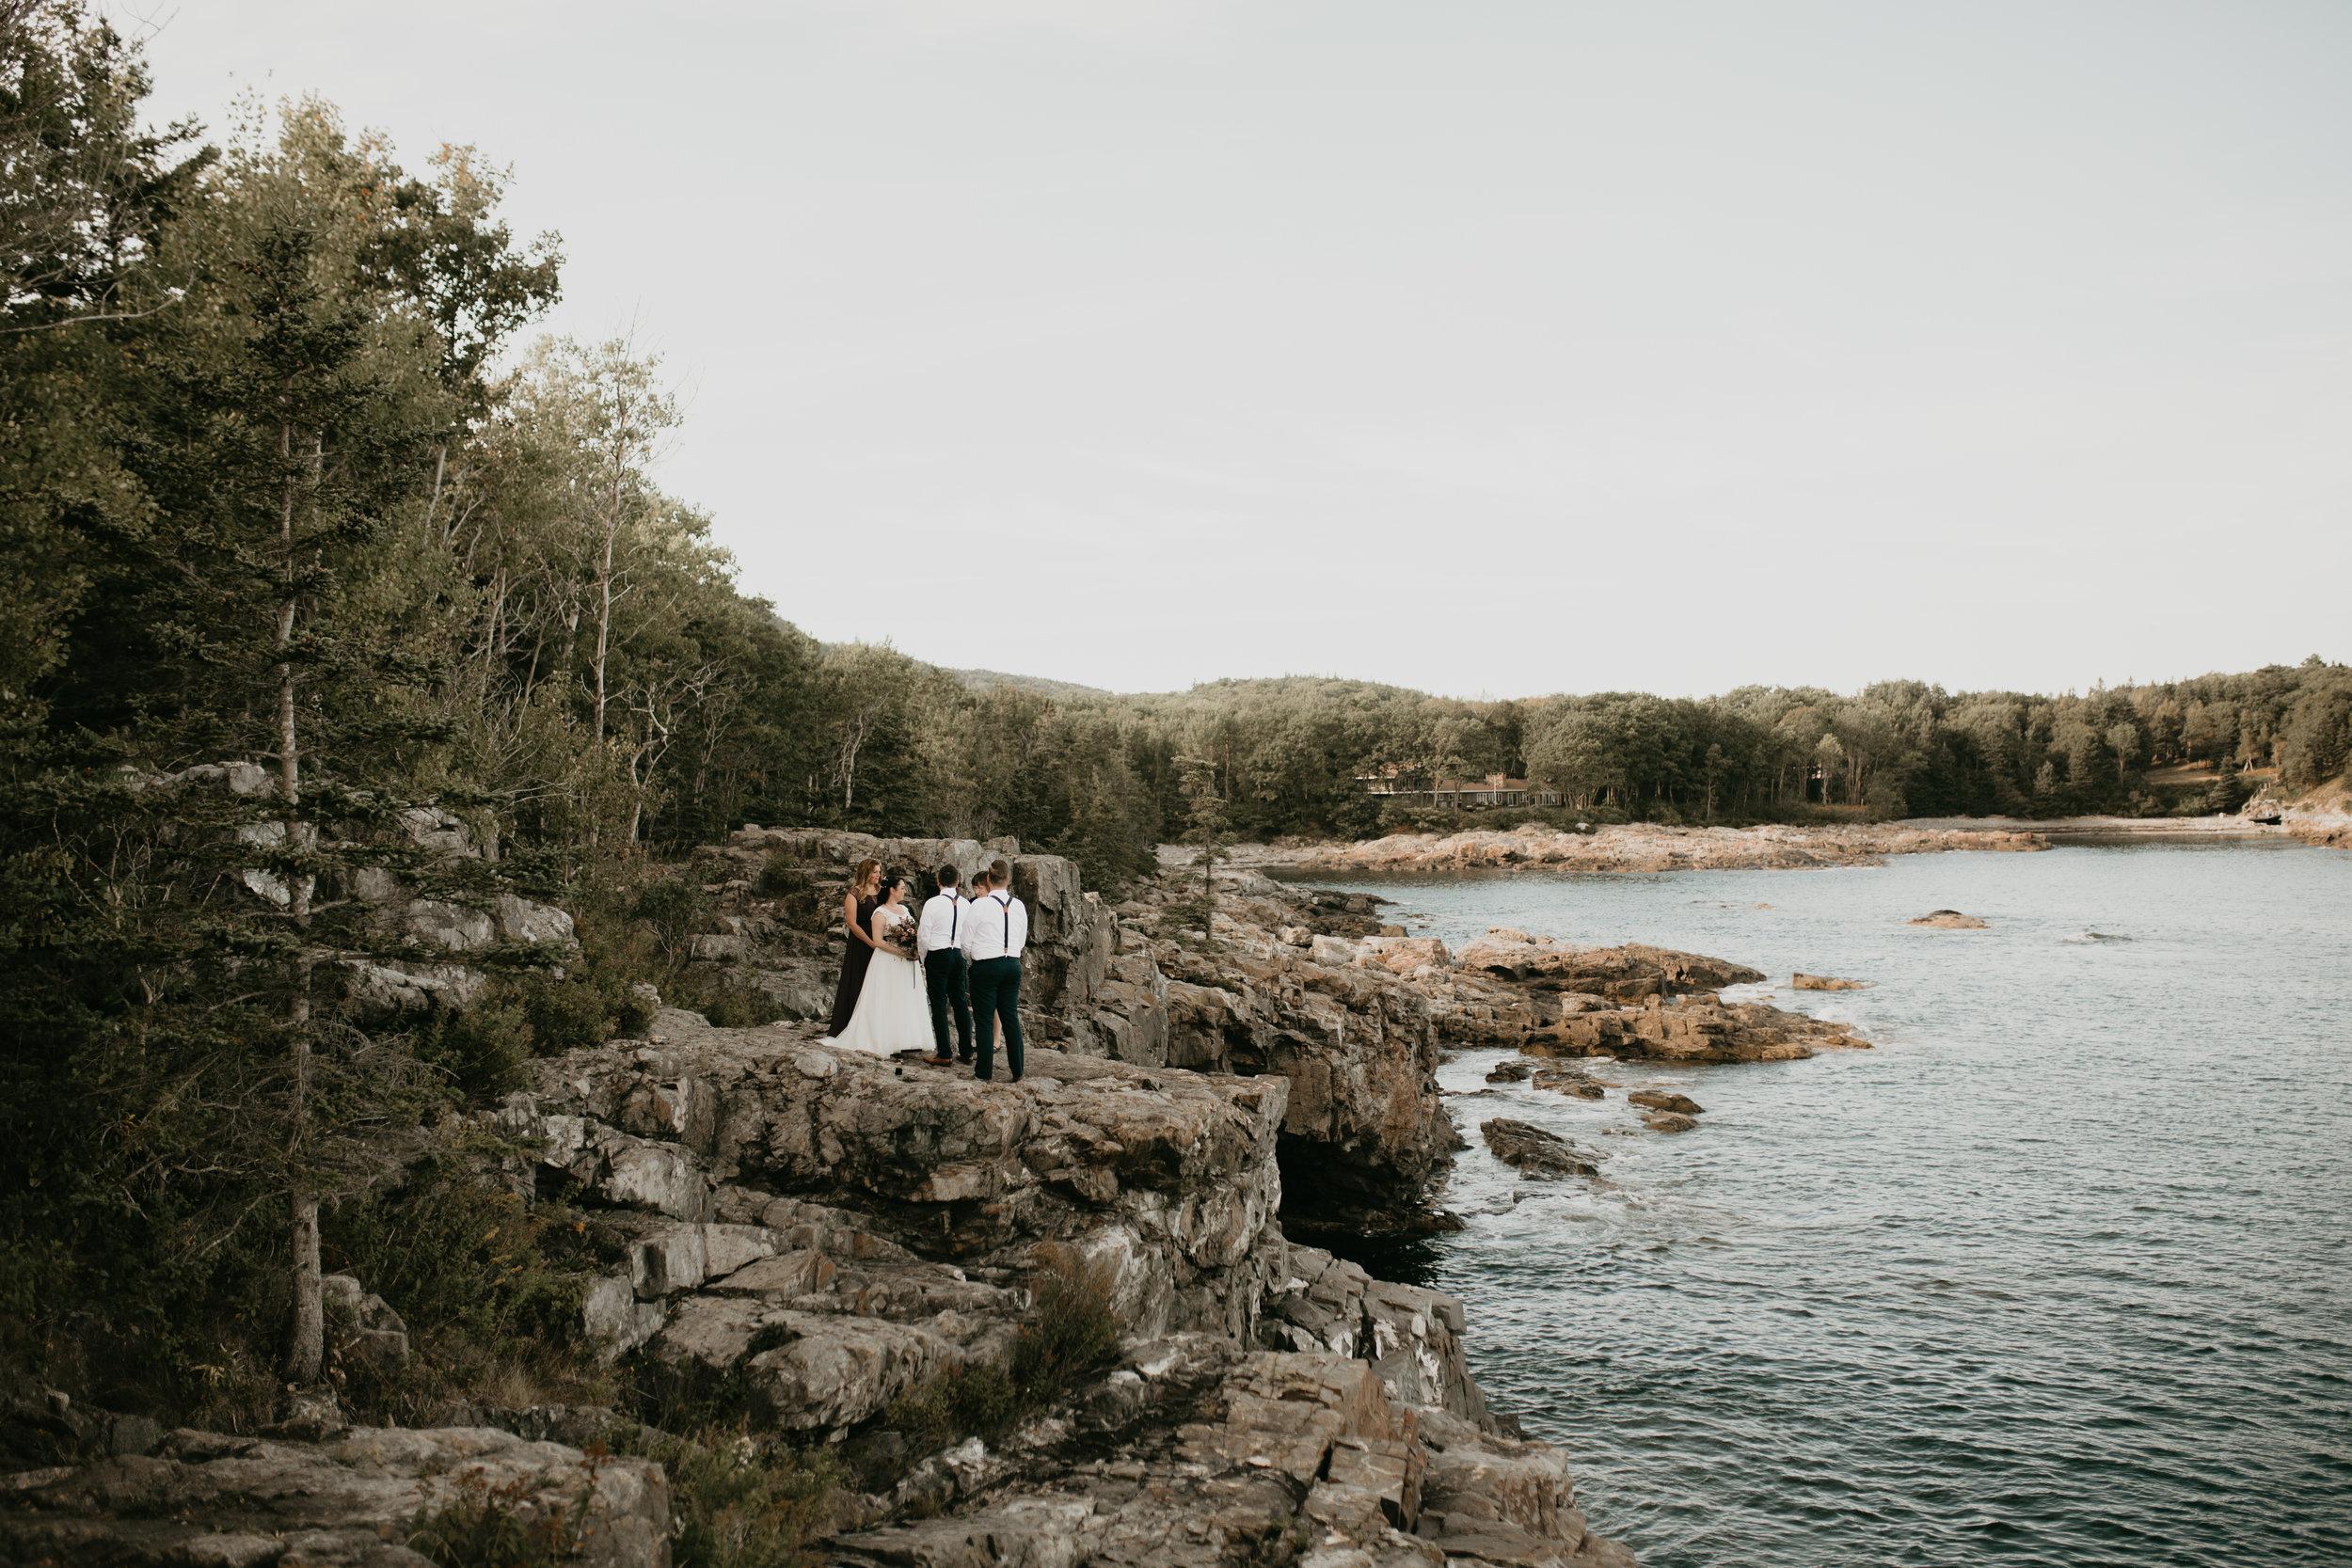 nicole-daacke-photography-Elopement-rocky-shoreline-coast-Acadia-National-Park-elopement-photographer-inspiration-maine-elopement-otter-cliffs-schoonic-head-point-20.jpg